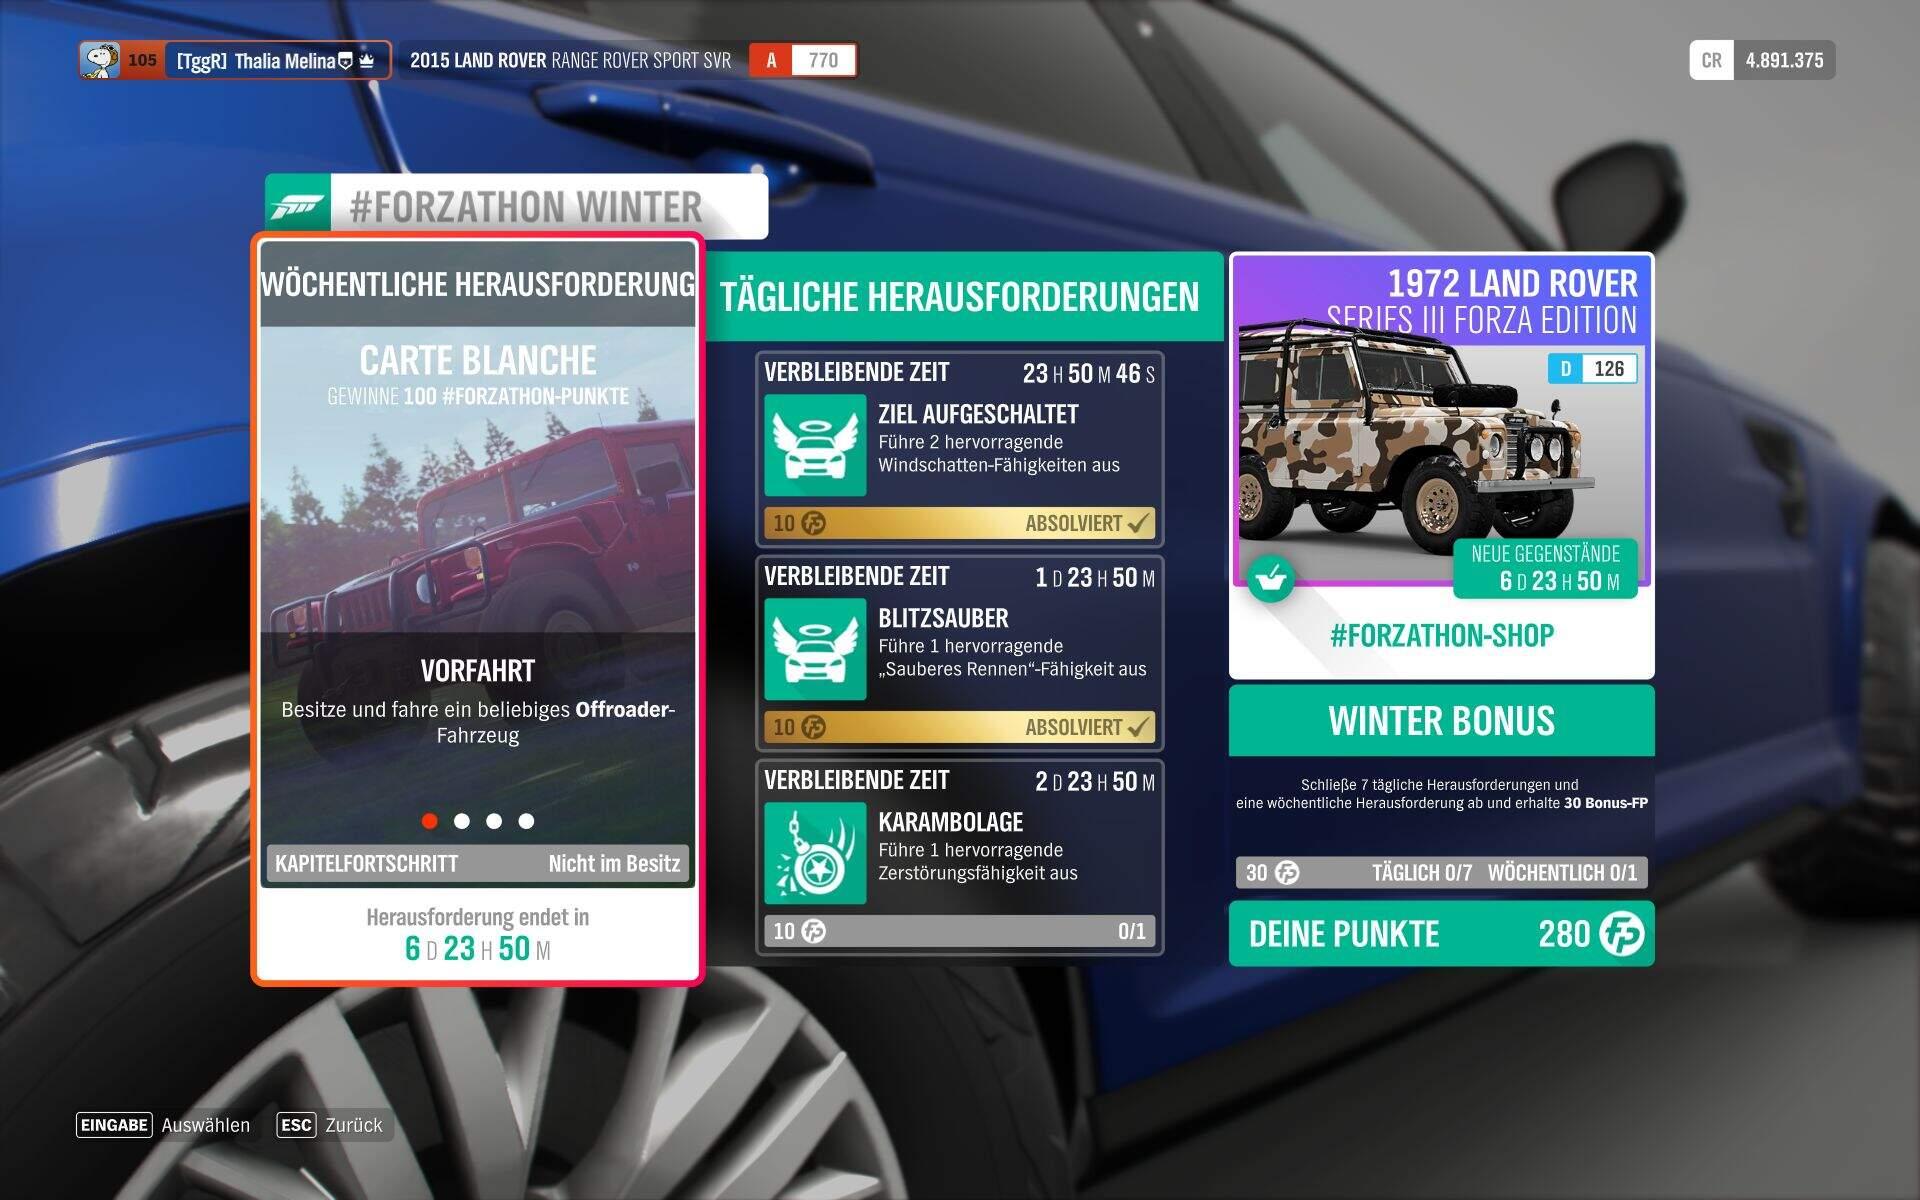 Forza Horizon 4 #Forzathon Guide KW 41 – Carte Blanche Aufgabe 1